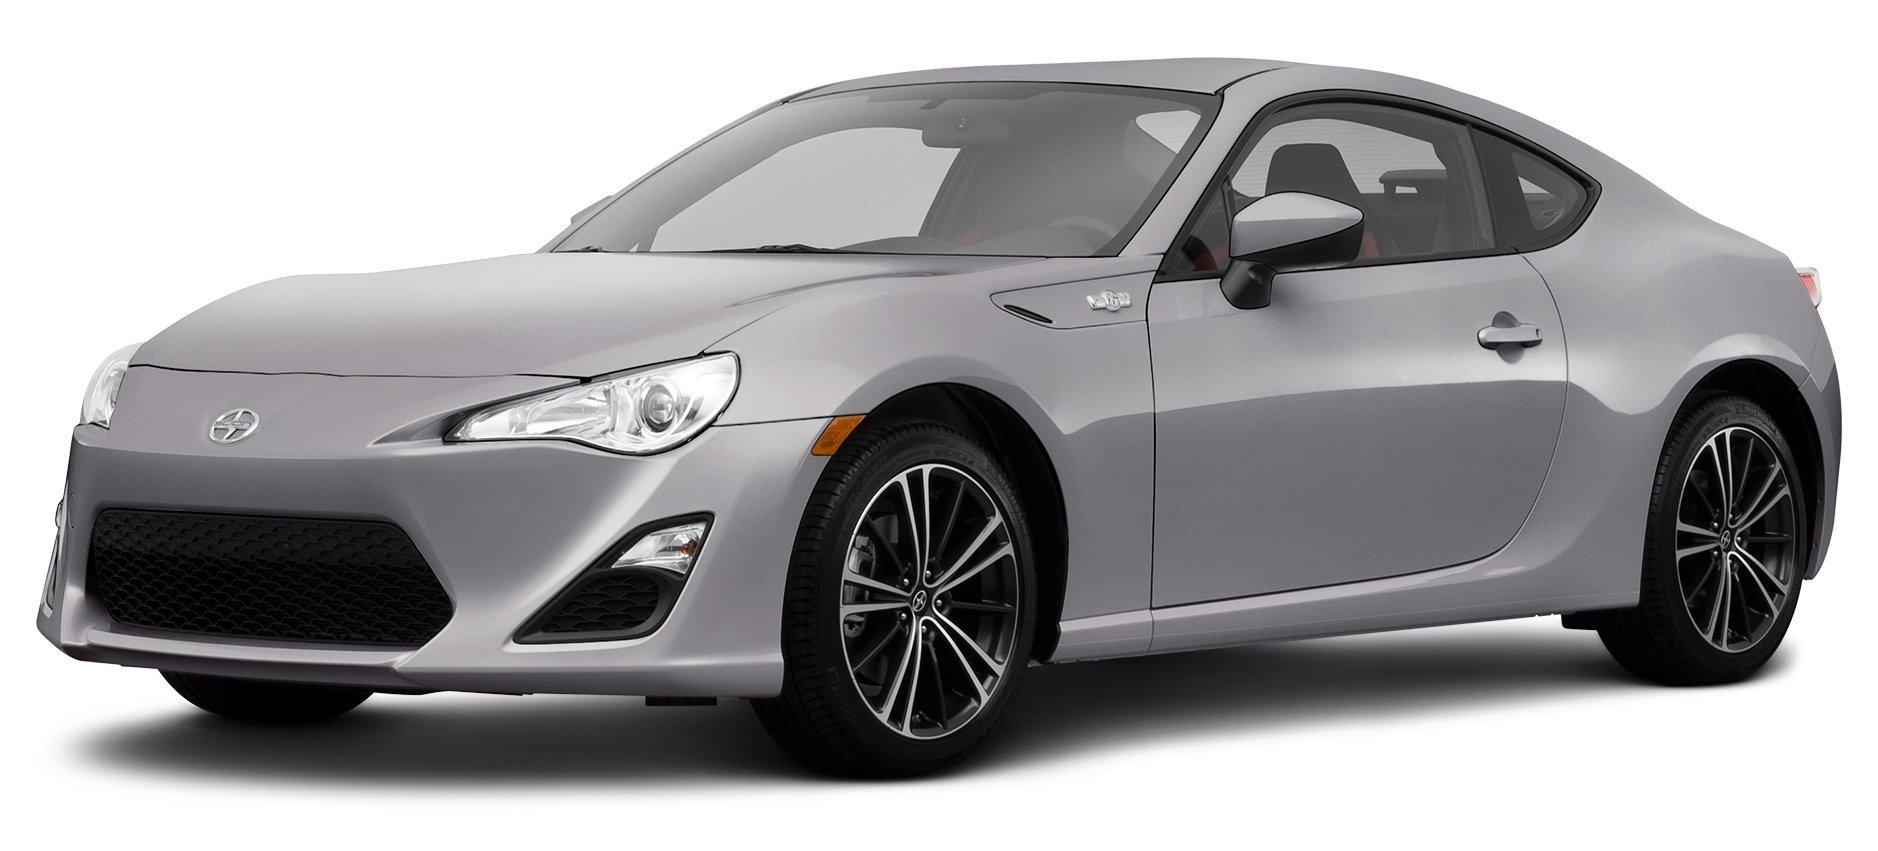 ... 2013 Scion FR-S, 2-Door Coupe Automatic Transmission (Natl). 2013 Hyundai Genesis Coupe 2.0T ...